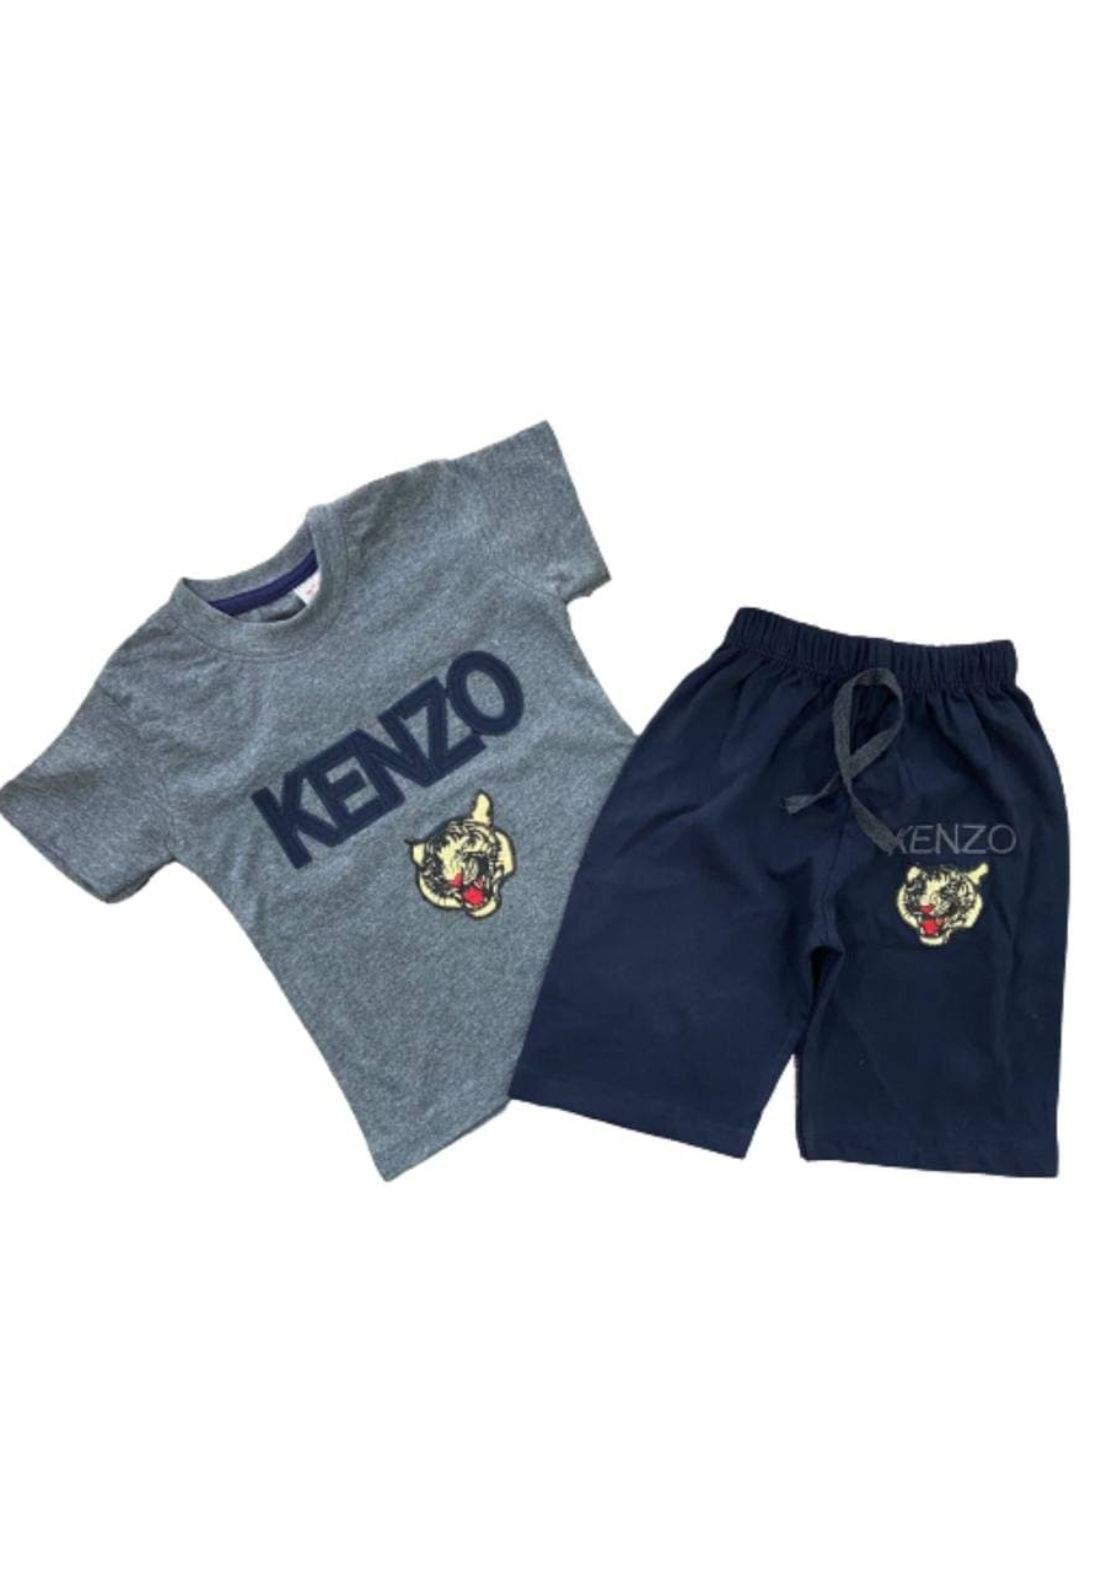 tracksuit for boys grey (t-shirt+short) ( تراكسوت ولادي رصاصي(شورت و تيشيرت